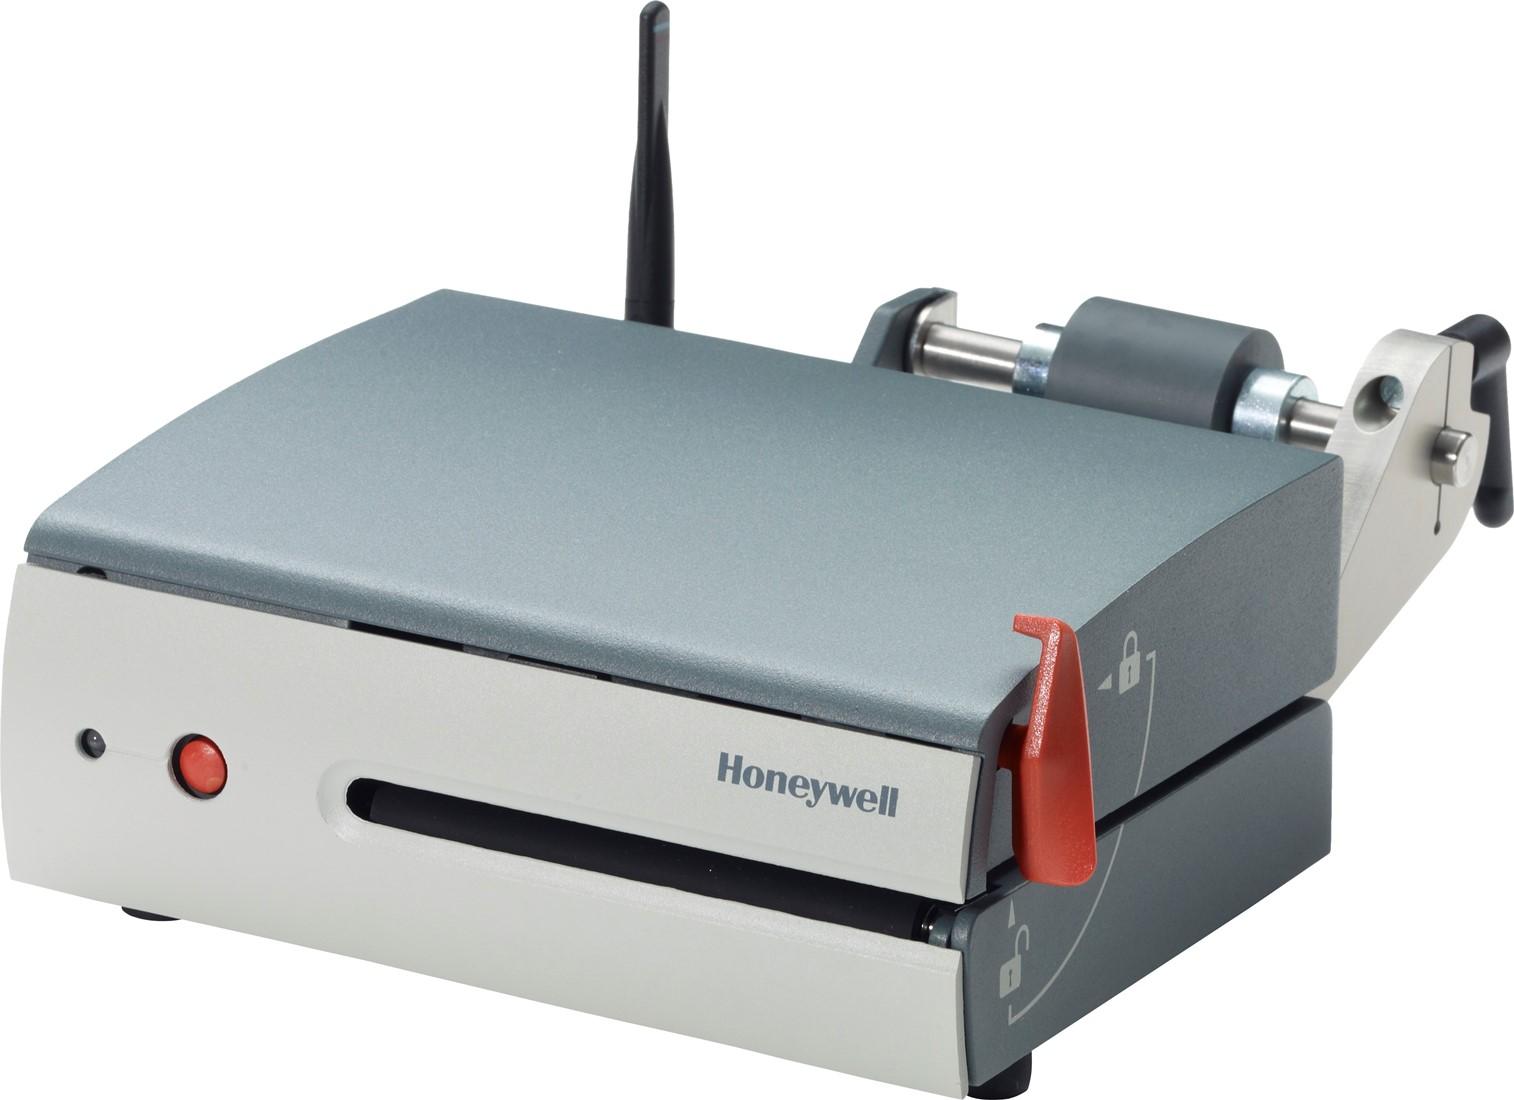 Honewell MP Compact 4 Mobile Mark III 203dpi (USB-SER-ETH-WLAN)